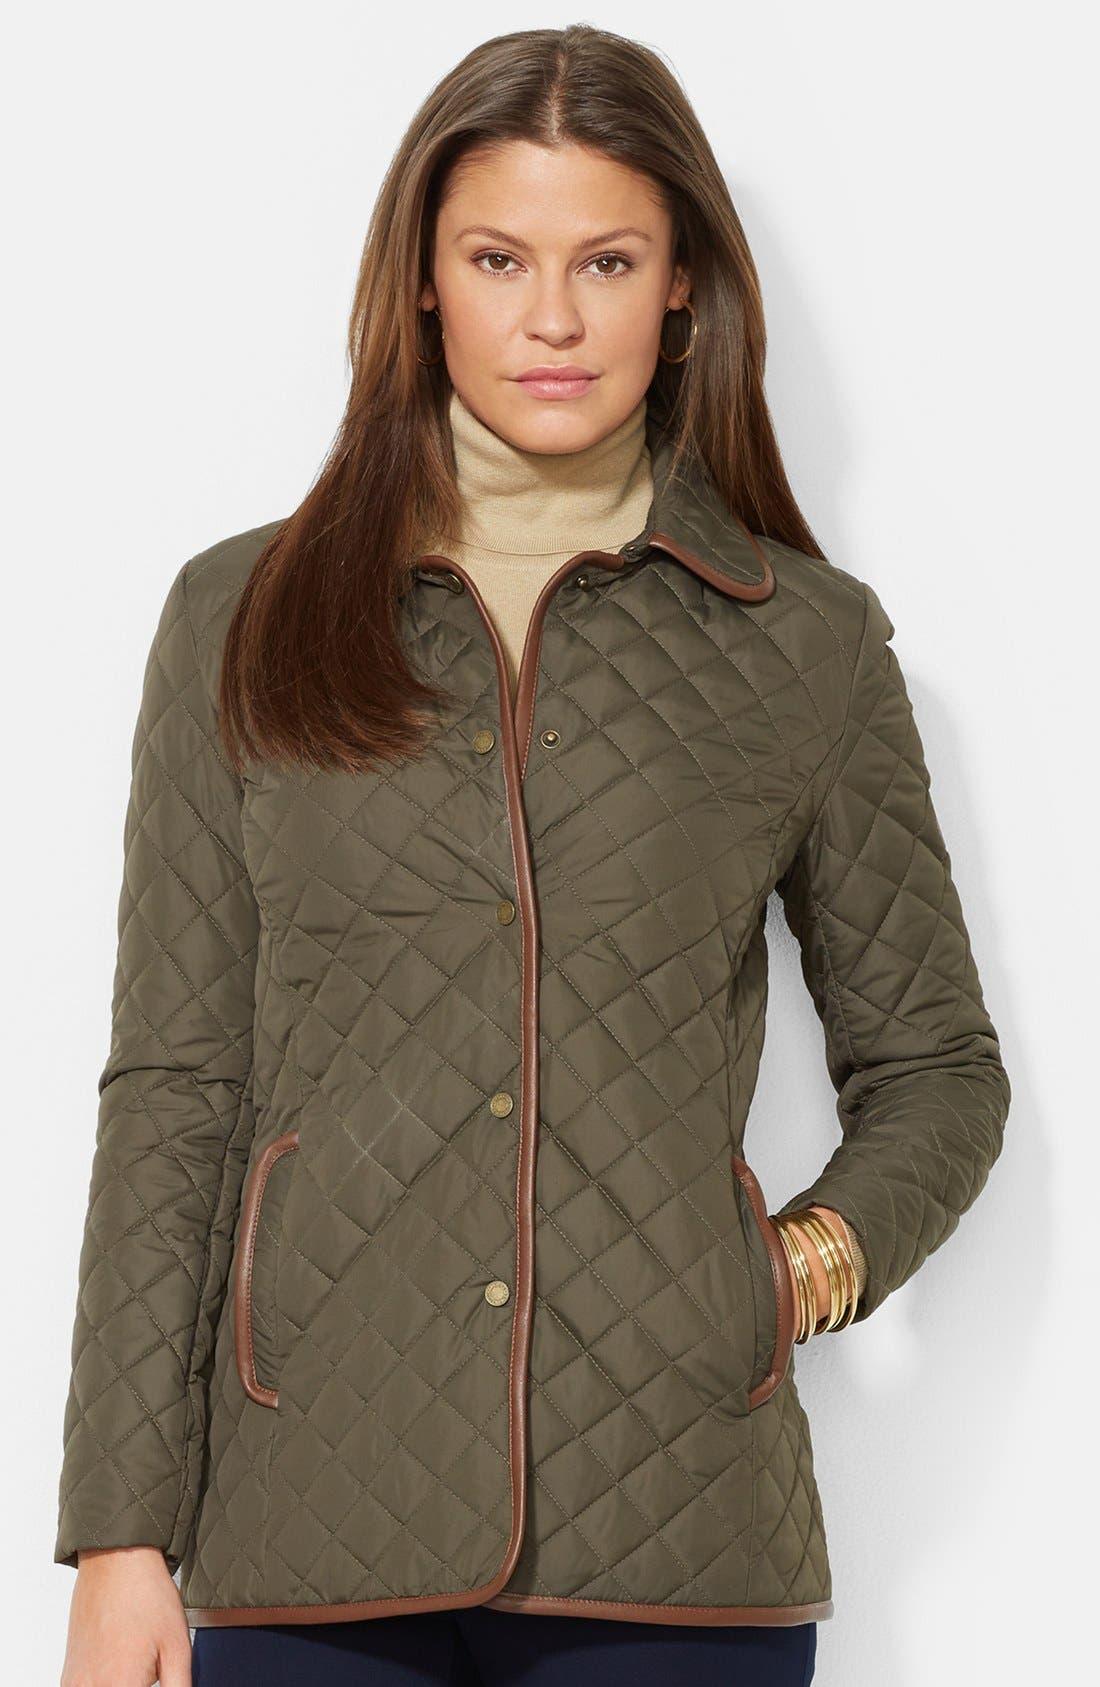 Alternate Image 1 Selected - Lauren Ralph Lauren Faux Leather Trim Quilted Jacket